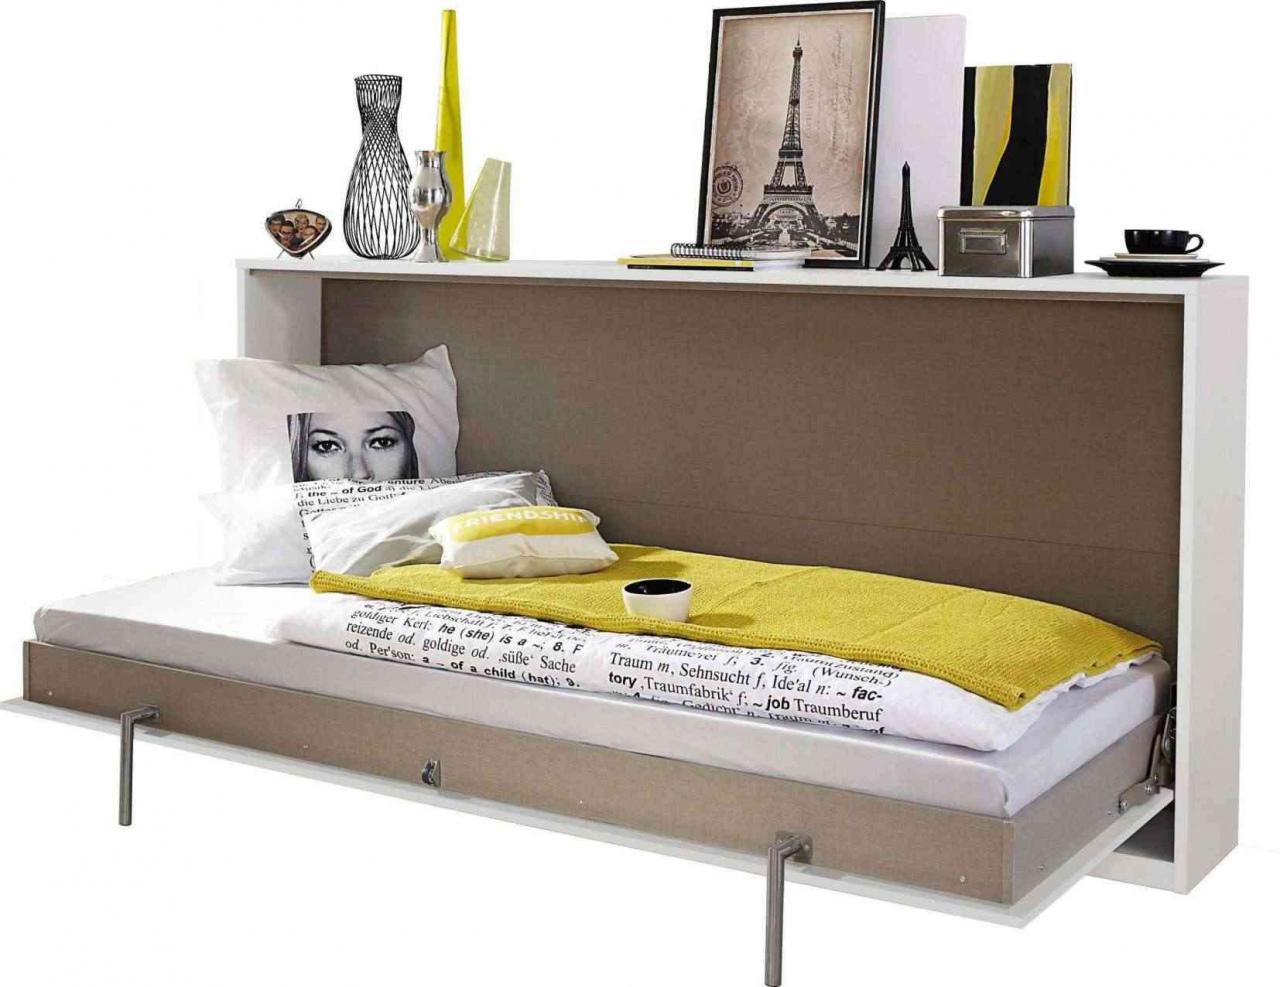 ikea metal bed frame ikea garten das beste von 18 twin over full bunk bed ikea durch ikea metal bed frame